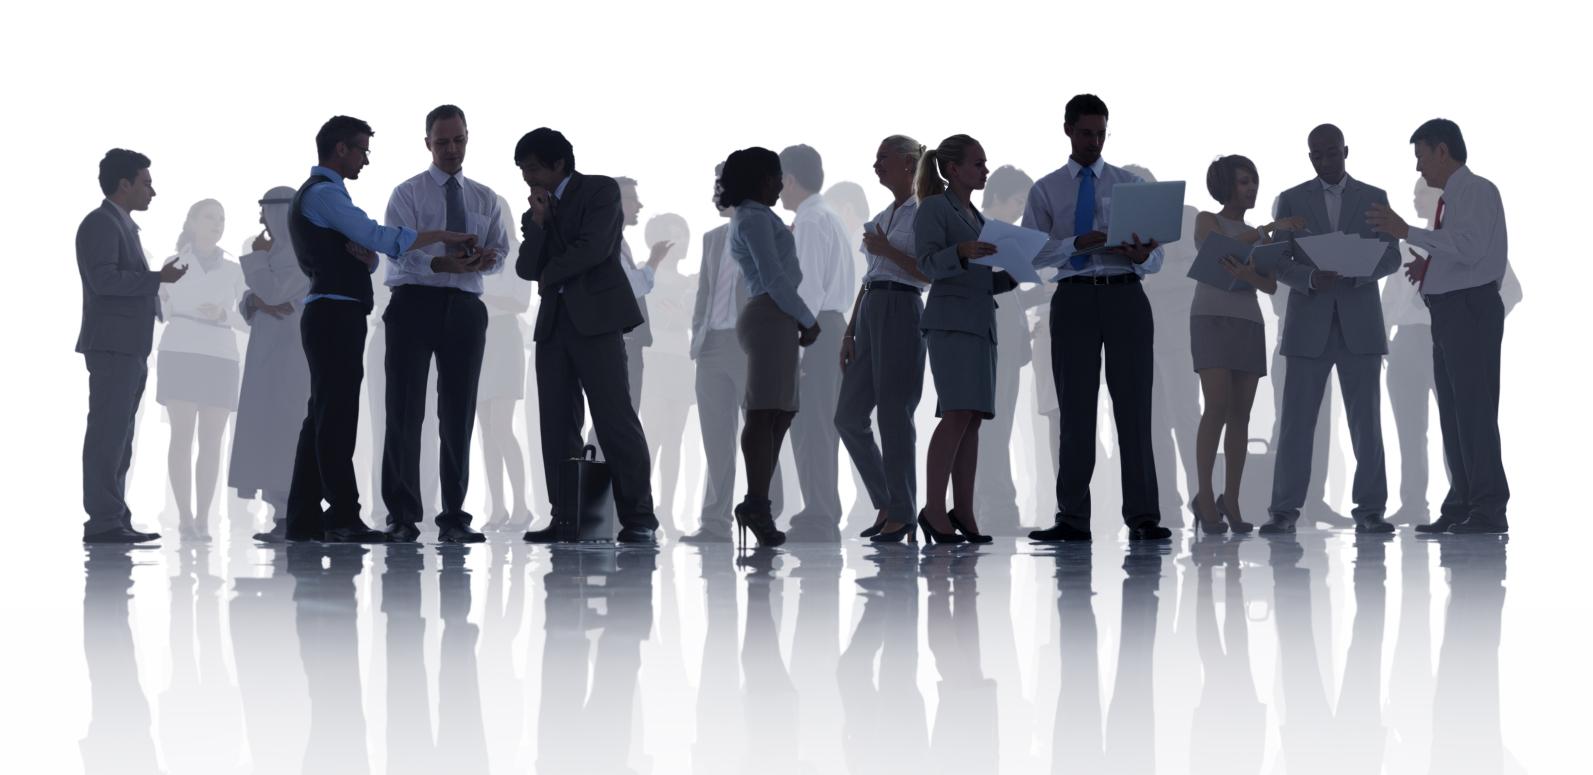 vector freeuse Free career fair cliparts. Careers clipart job announcement